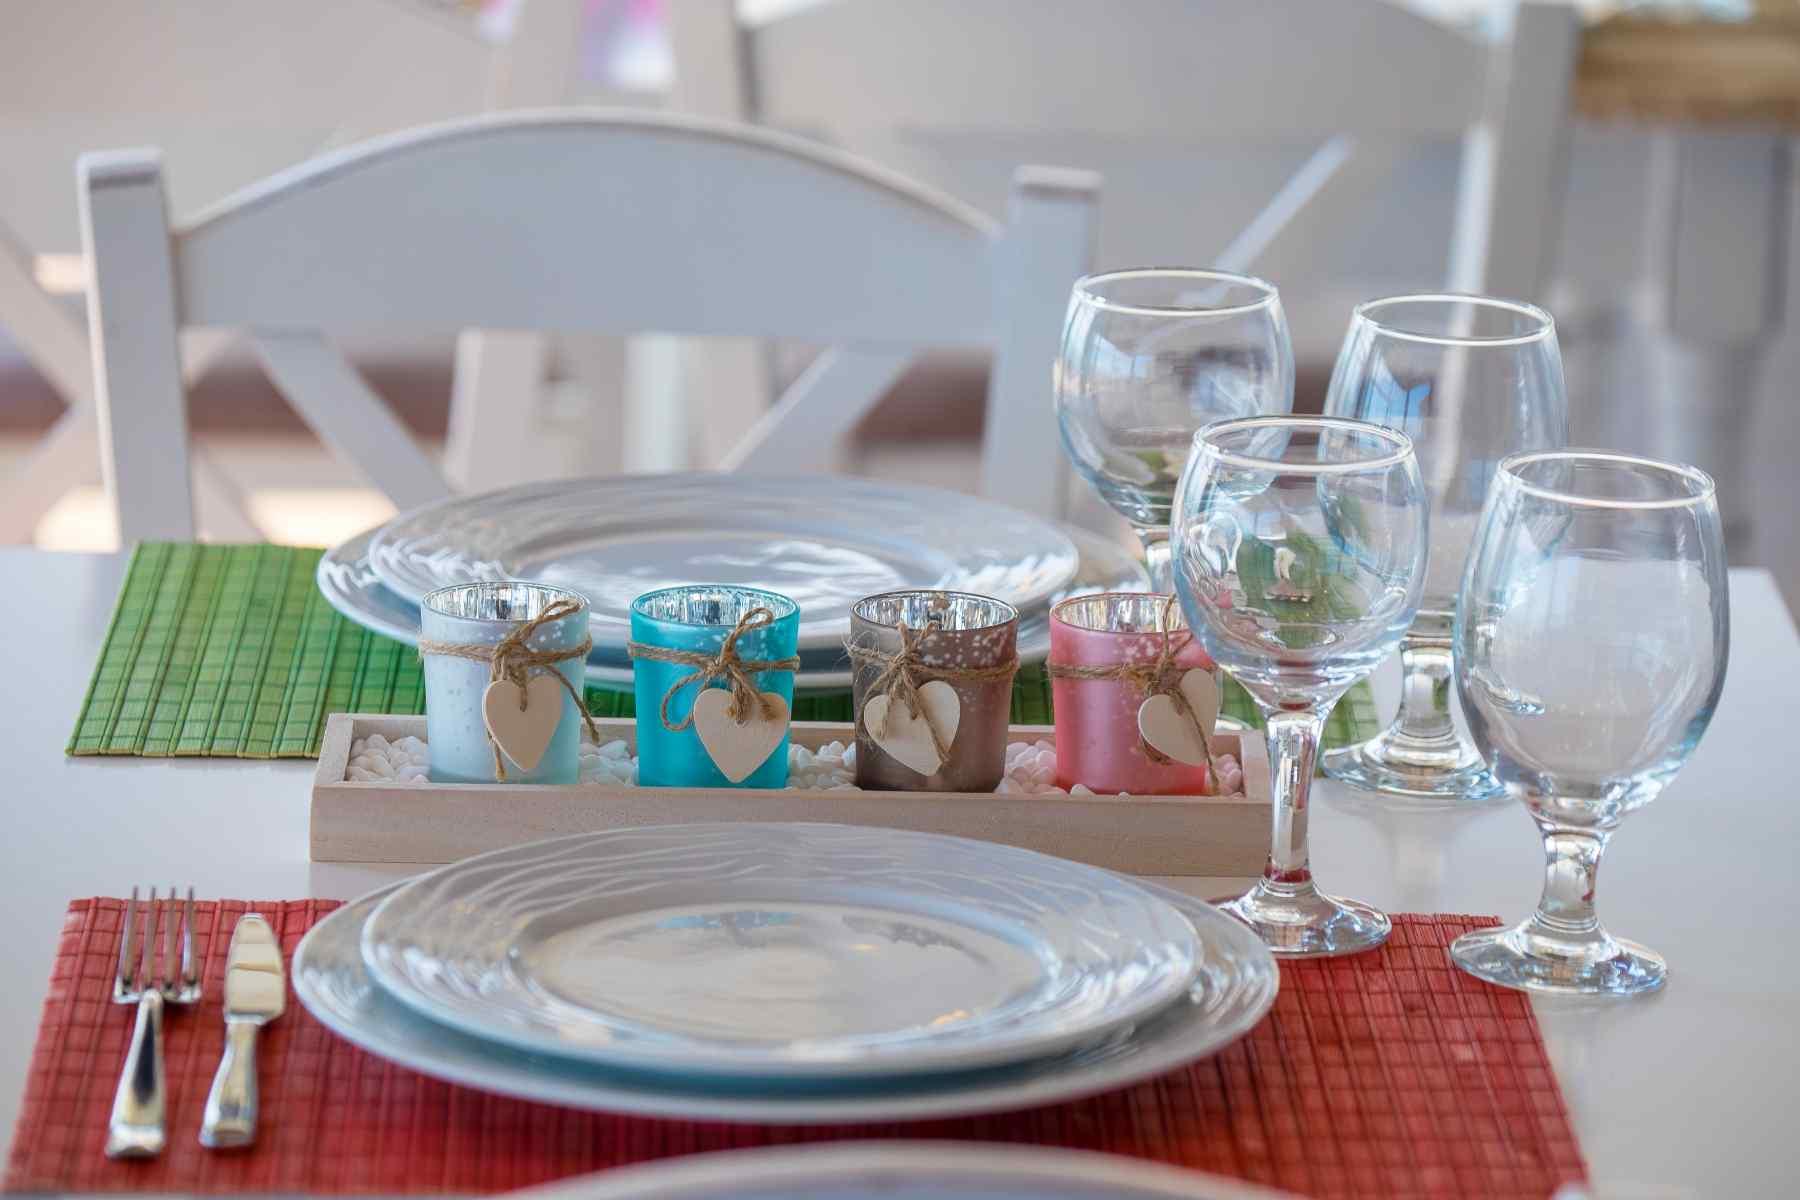 Must Boutique Hotel, Ξενοδοχείο στο Κανάλι Πρέβεζας, Εστιατόριο με πλούσιες γεύσεις